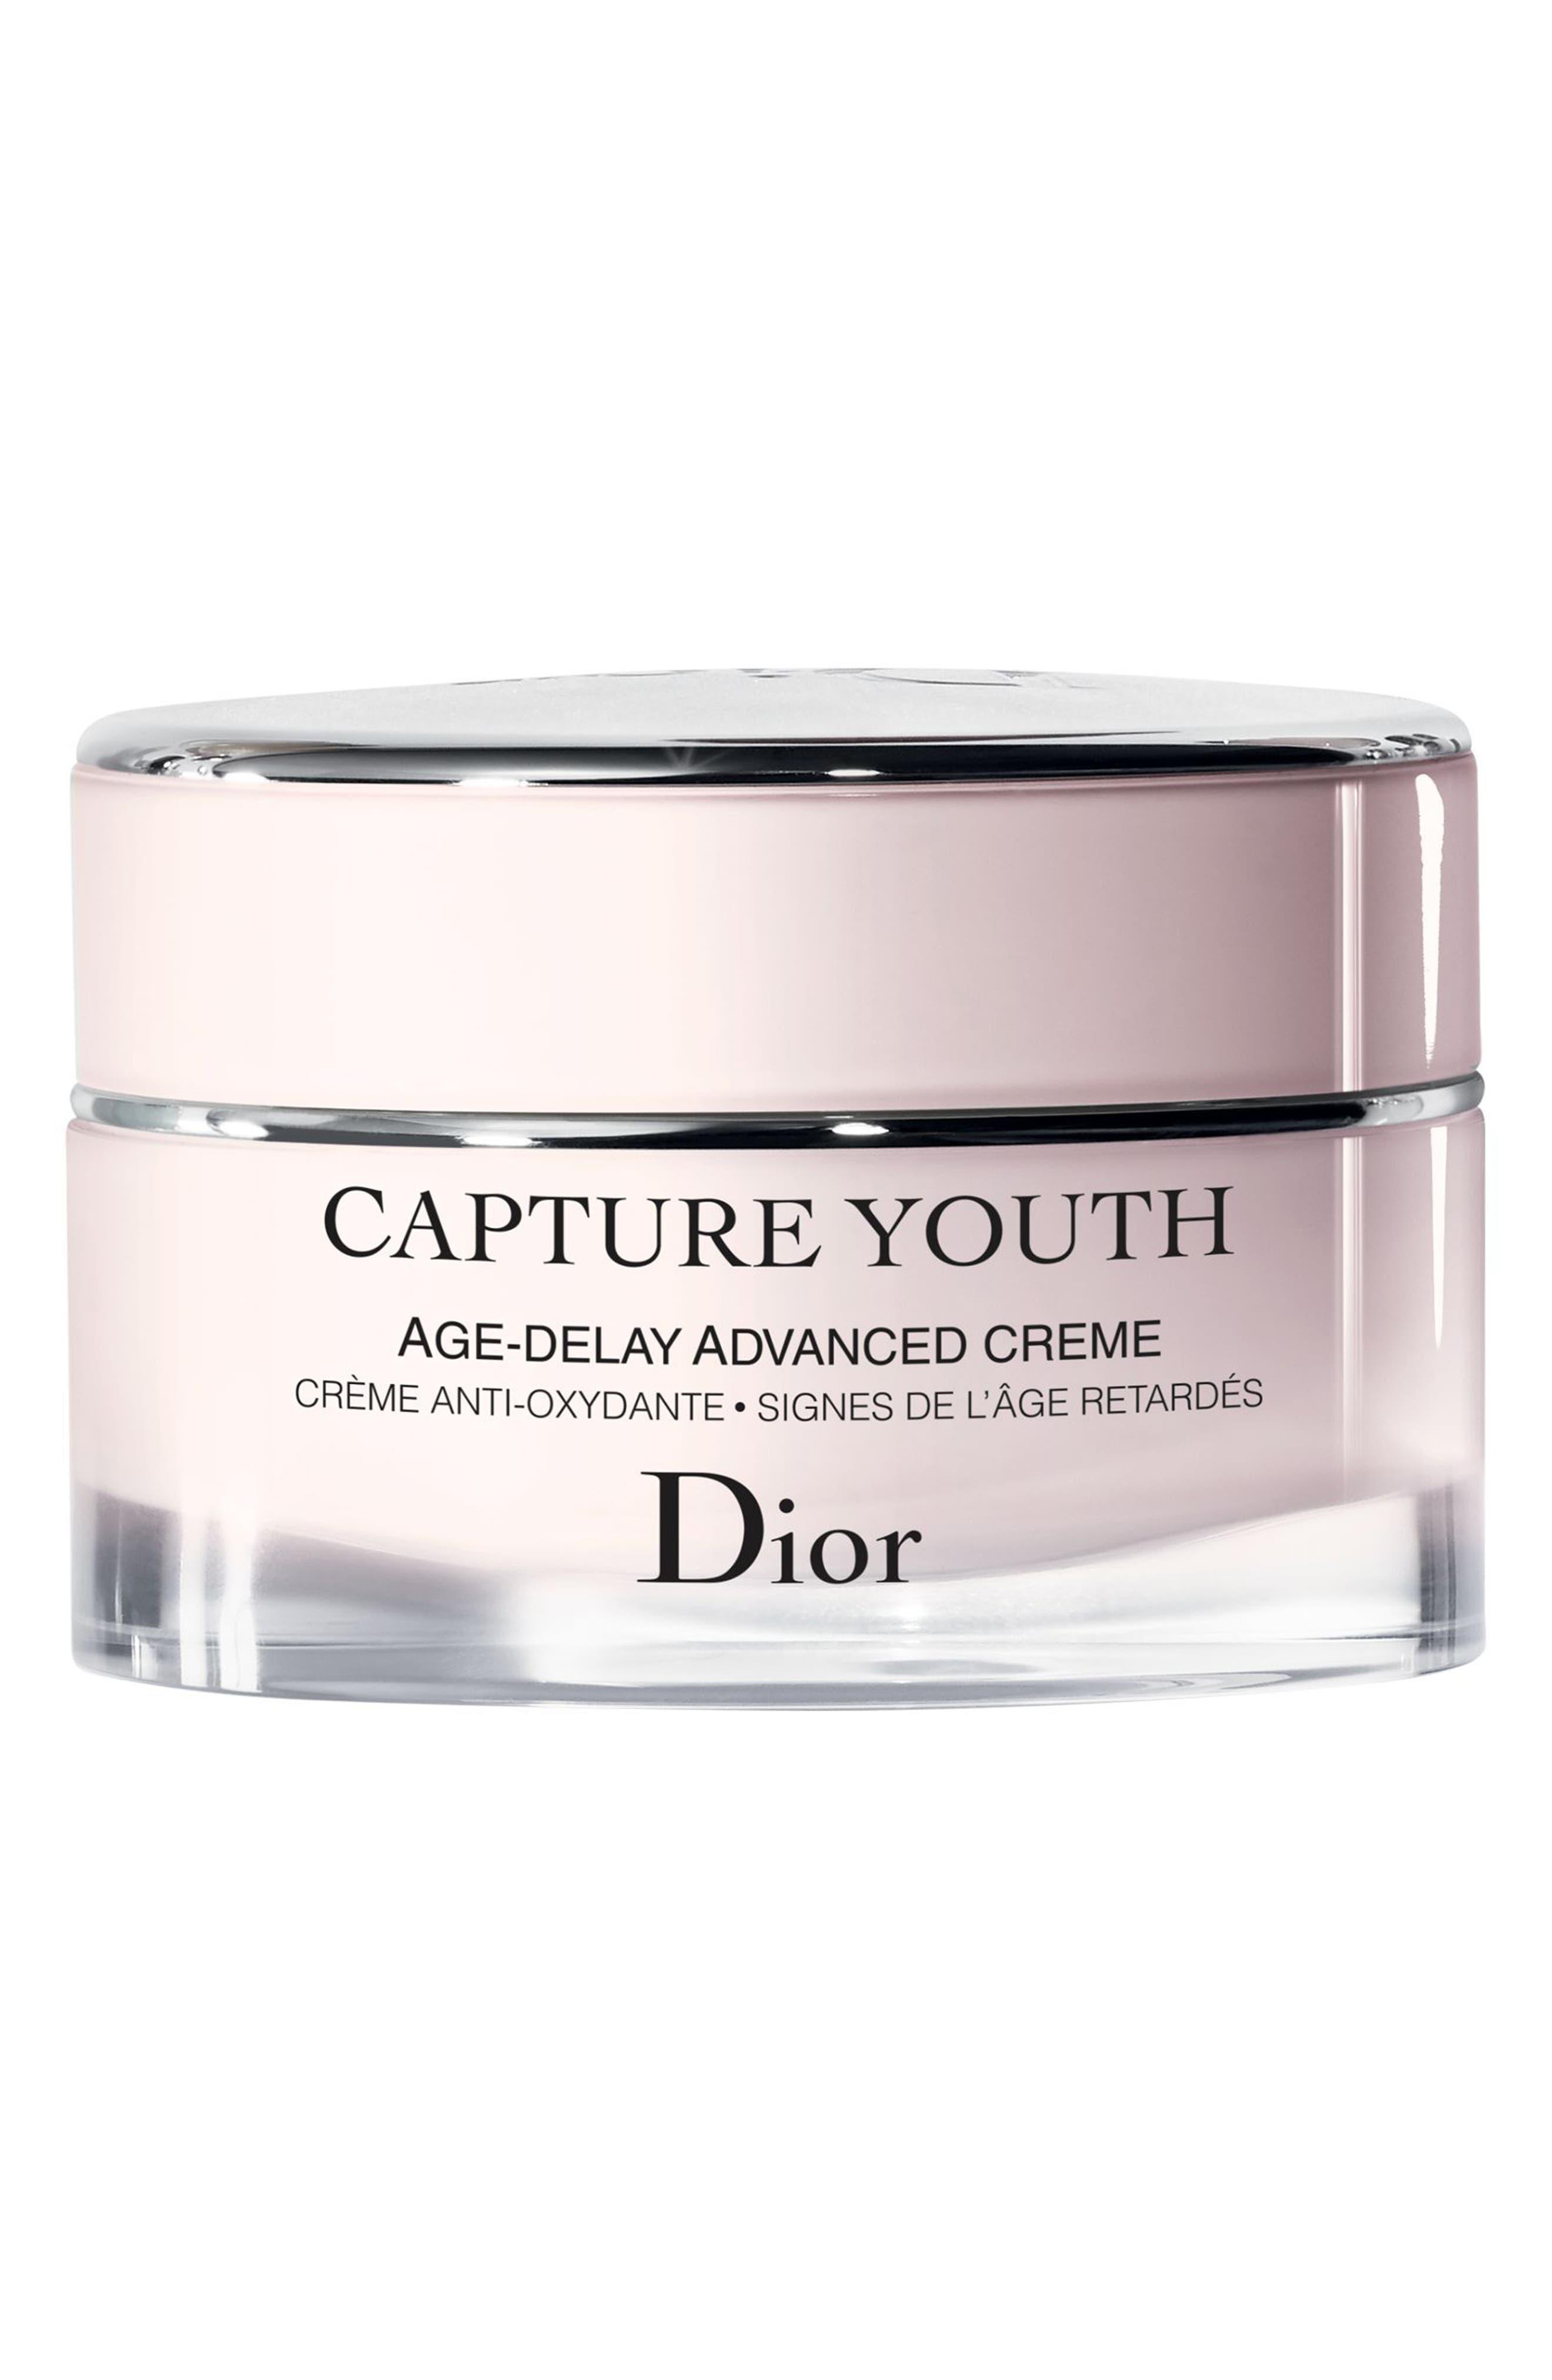 Capture Youth Age-Delay Advanced Crème,                             Main thumbnail 1, color,                             NO COLOR